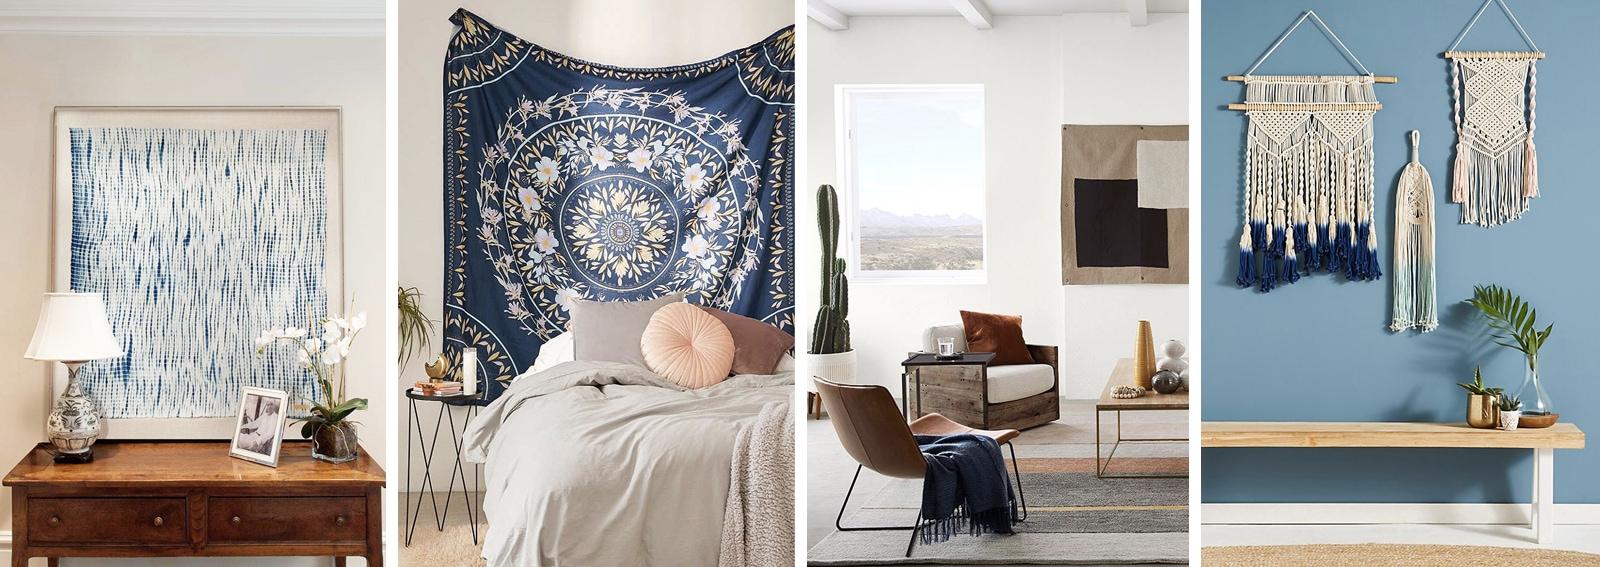 cover-decorare-pareti-tessili-desktop